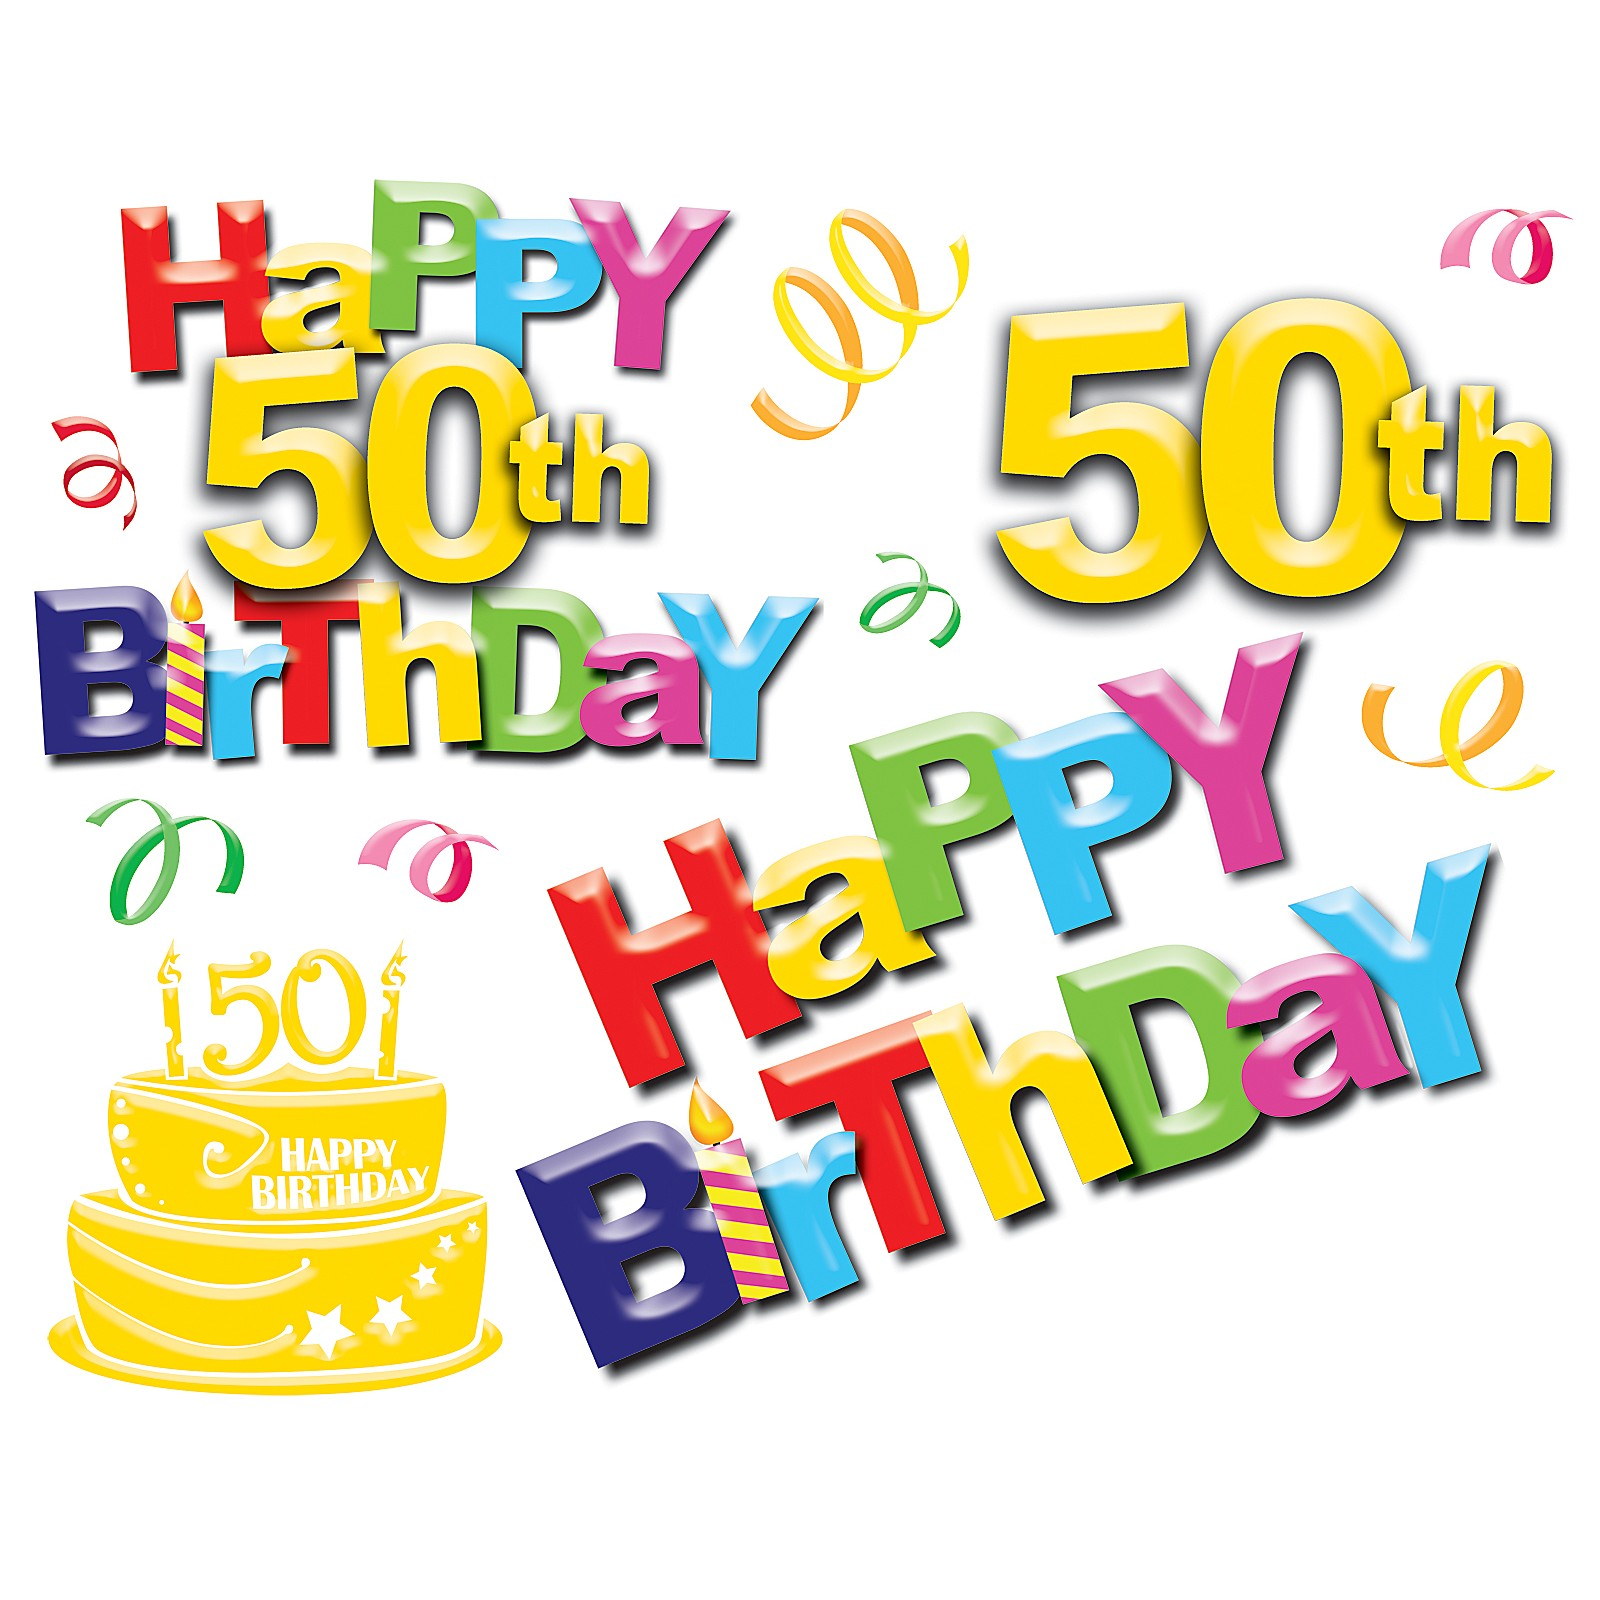 1600x1600 Free 50th Birthday Clip Art Amp Look At 50th Birthday Clip Art Clip